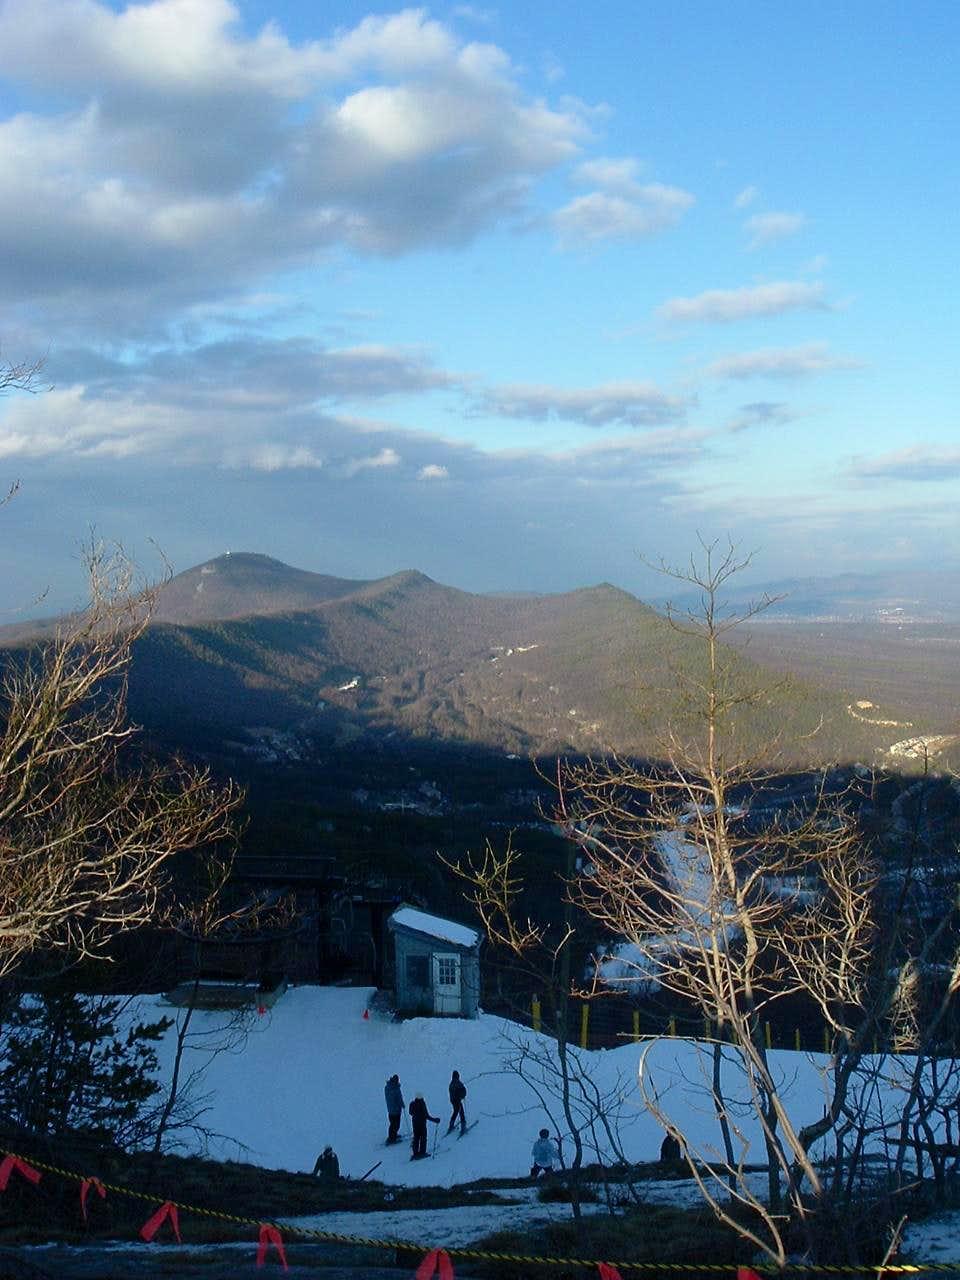 Looking North from Massanutten Ski Area